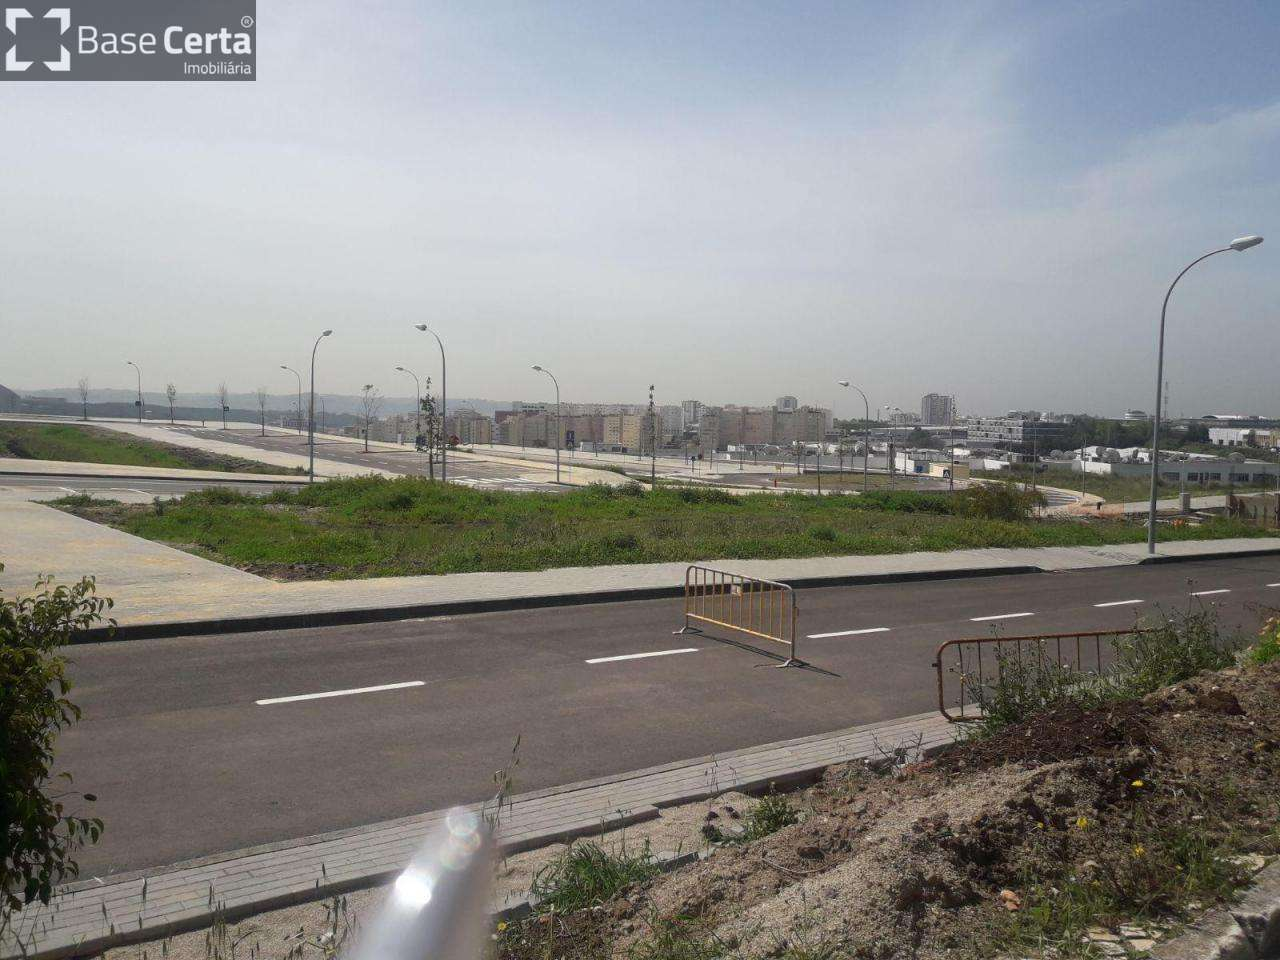 Terreno para comprar, Carnaxide e Queijas, Lisboa - Foto 1